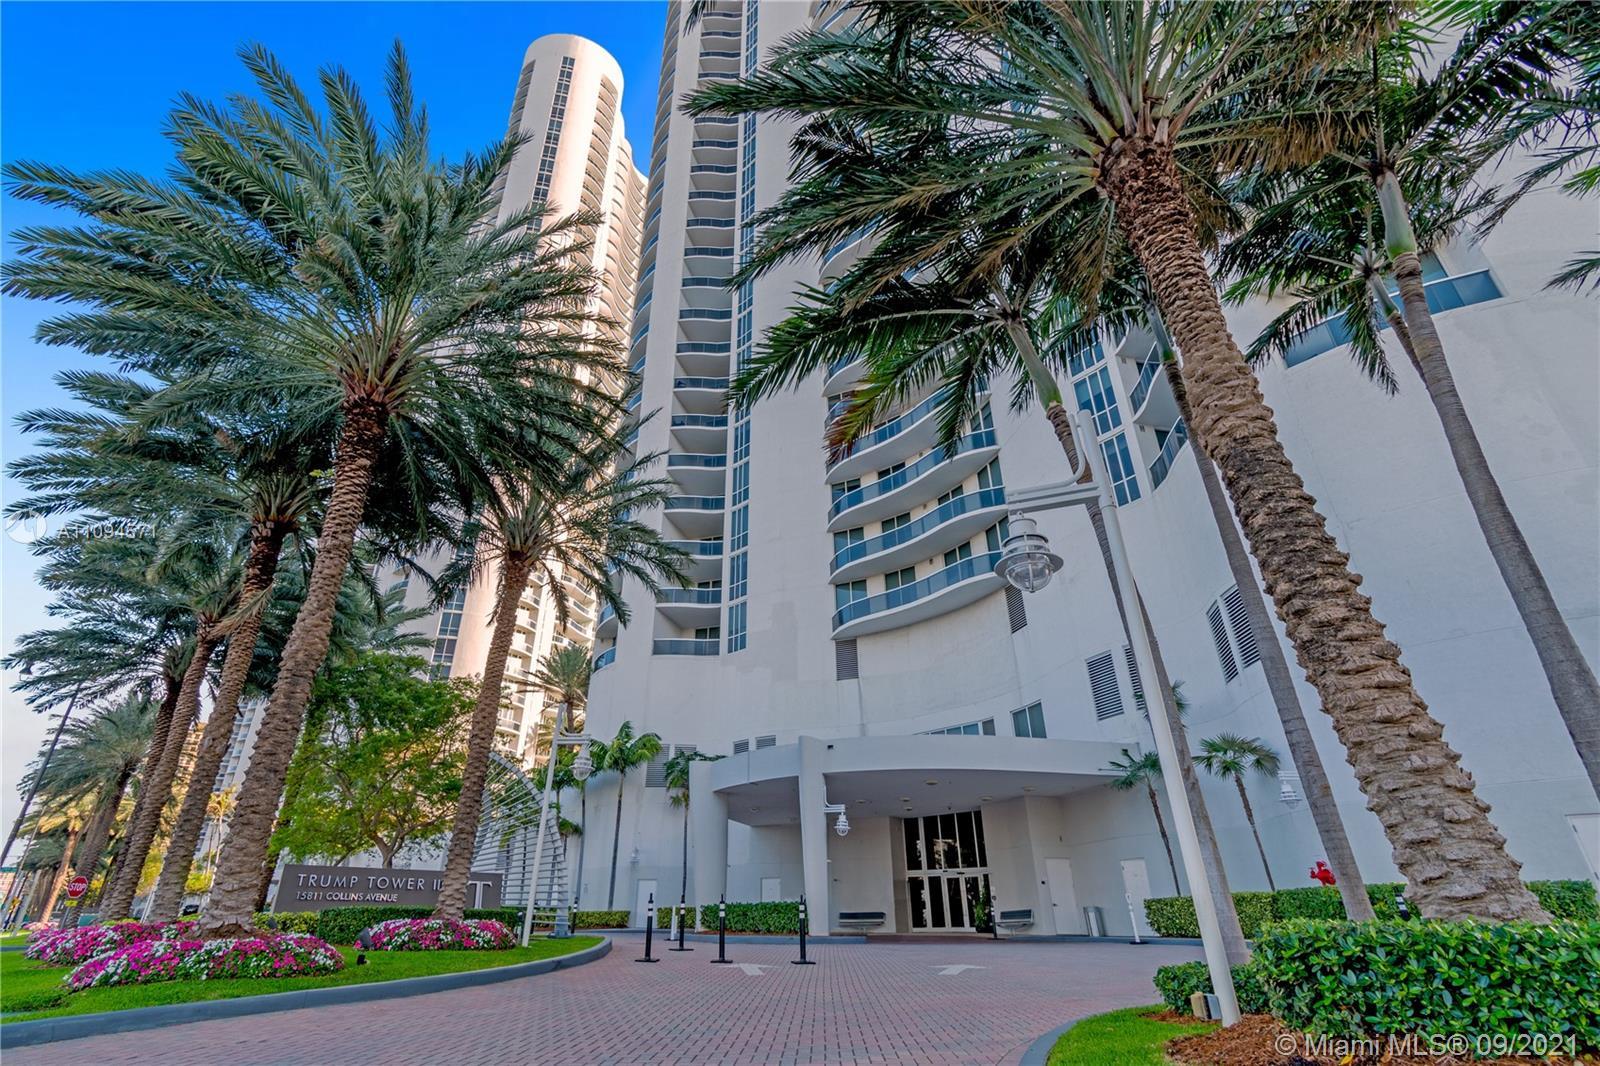 Trump Tower III #1802 - 15811 Collins Ave #1802, Sunny Isles Beach, FL 33160